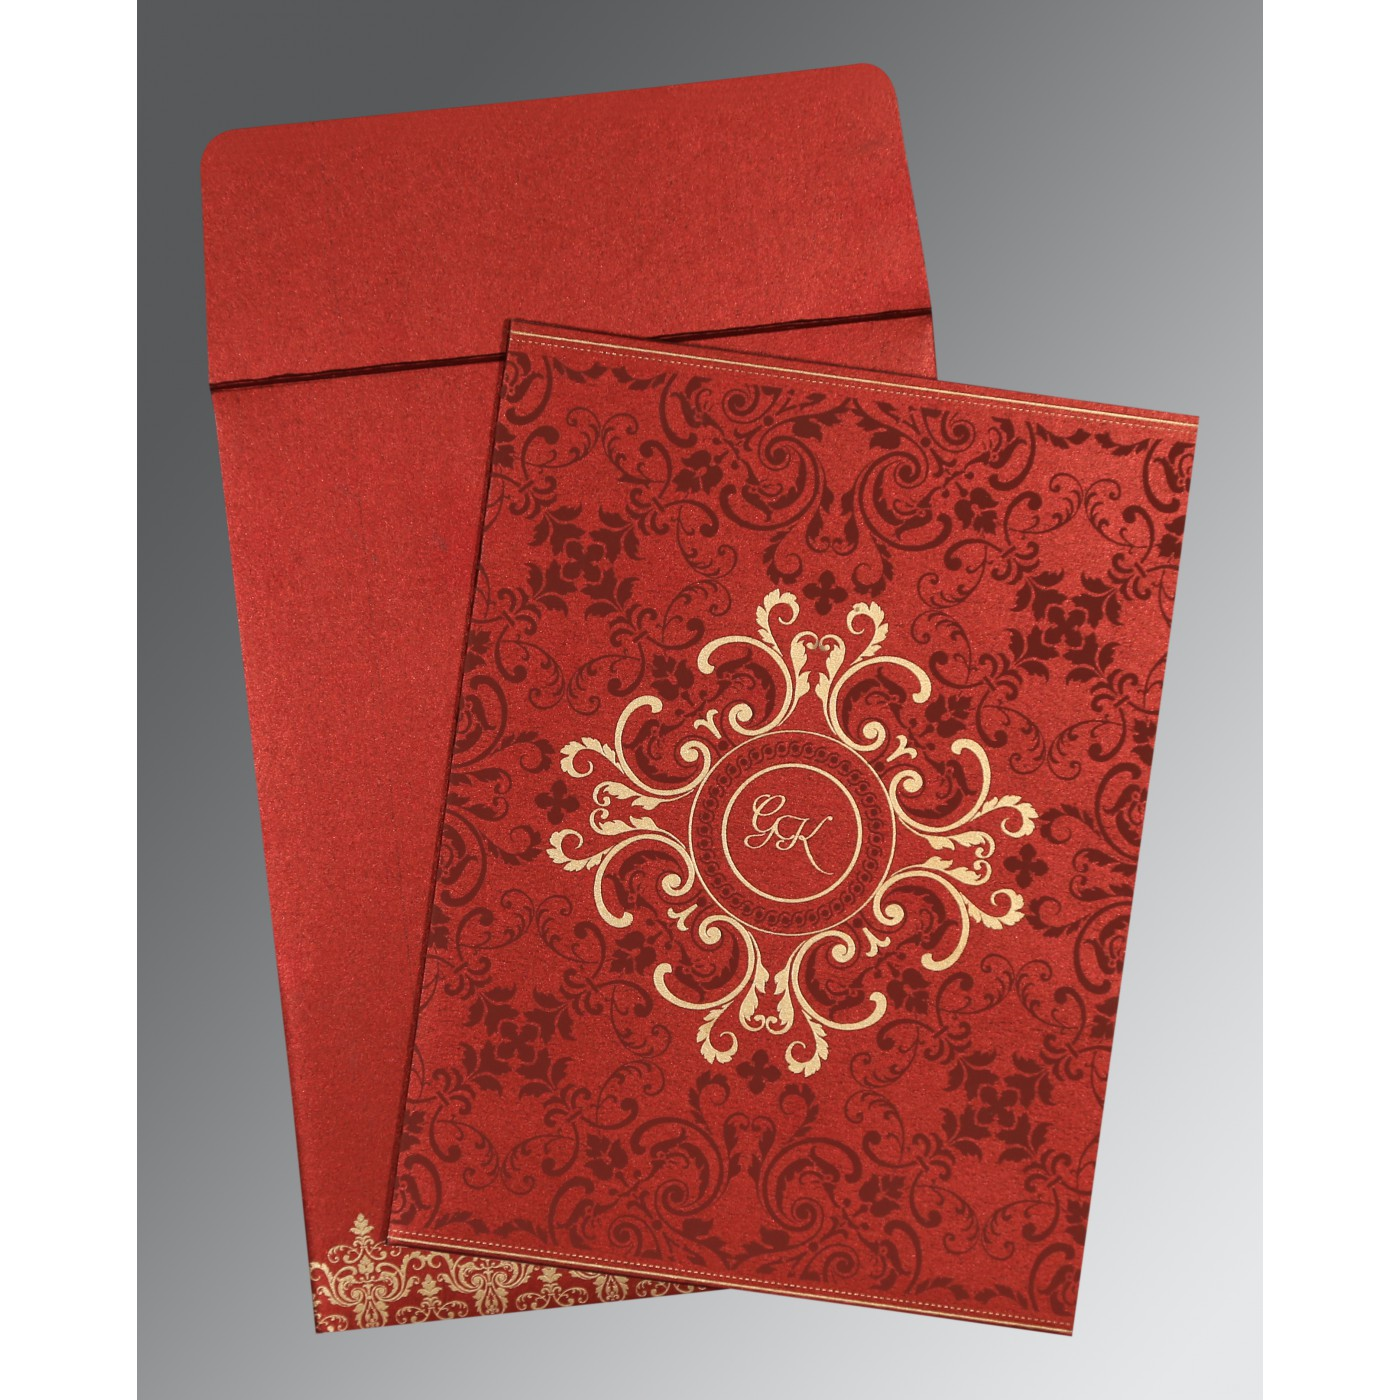 WINE RED SHIMMERY SCREEN PRINTED WEDDING CARD : C-8244E - 123WeddingCards